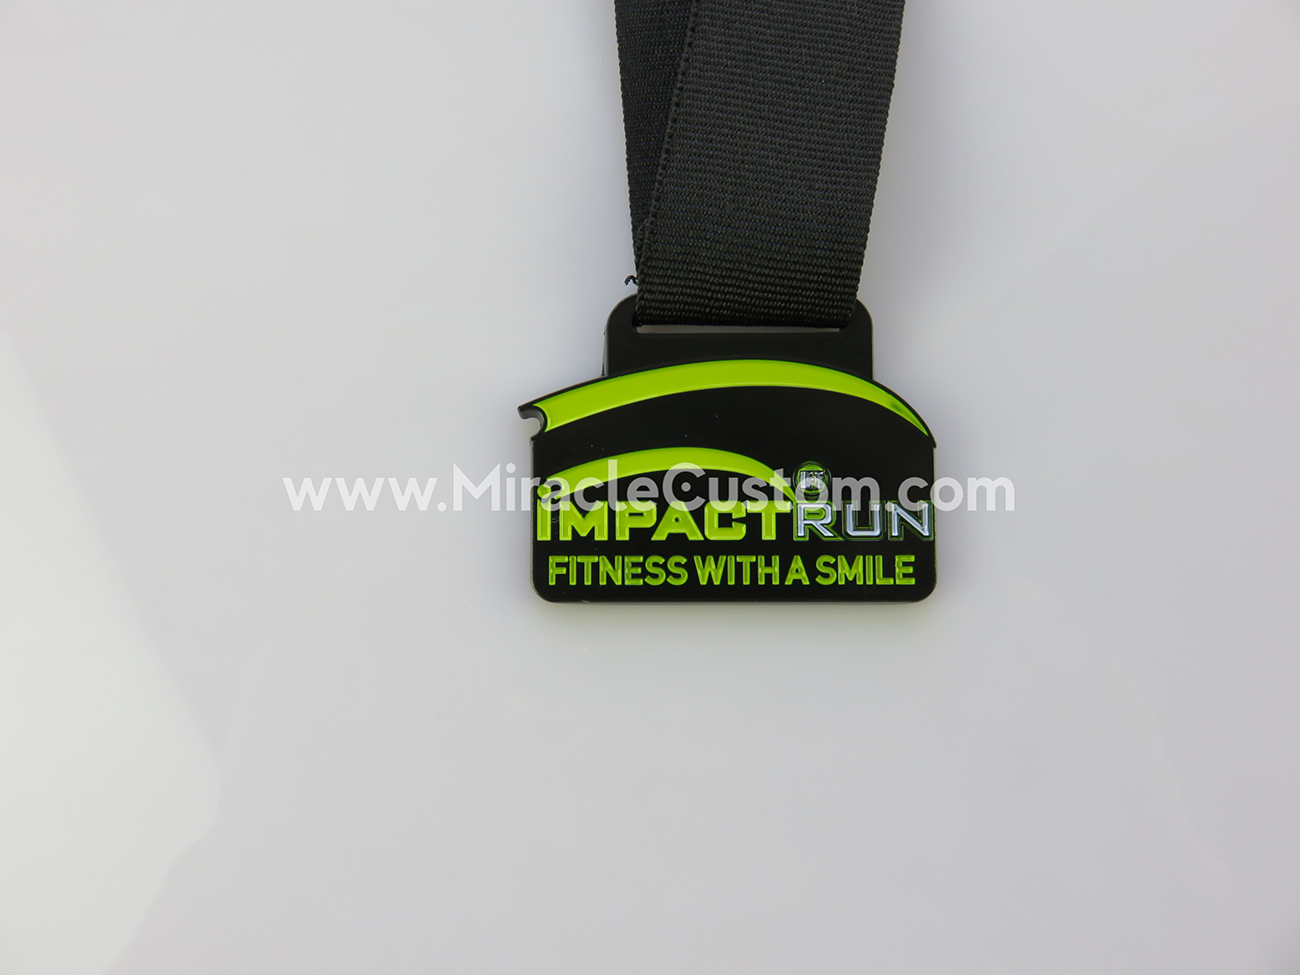 custom sports cast medals